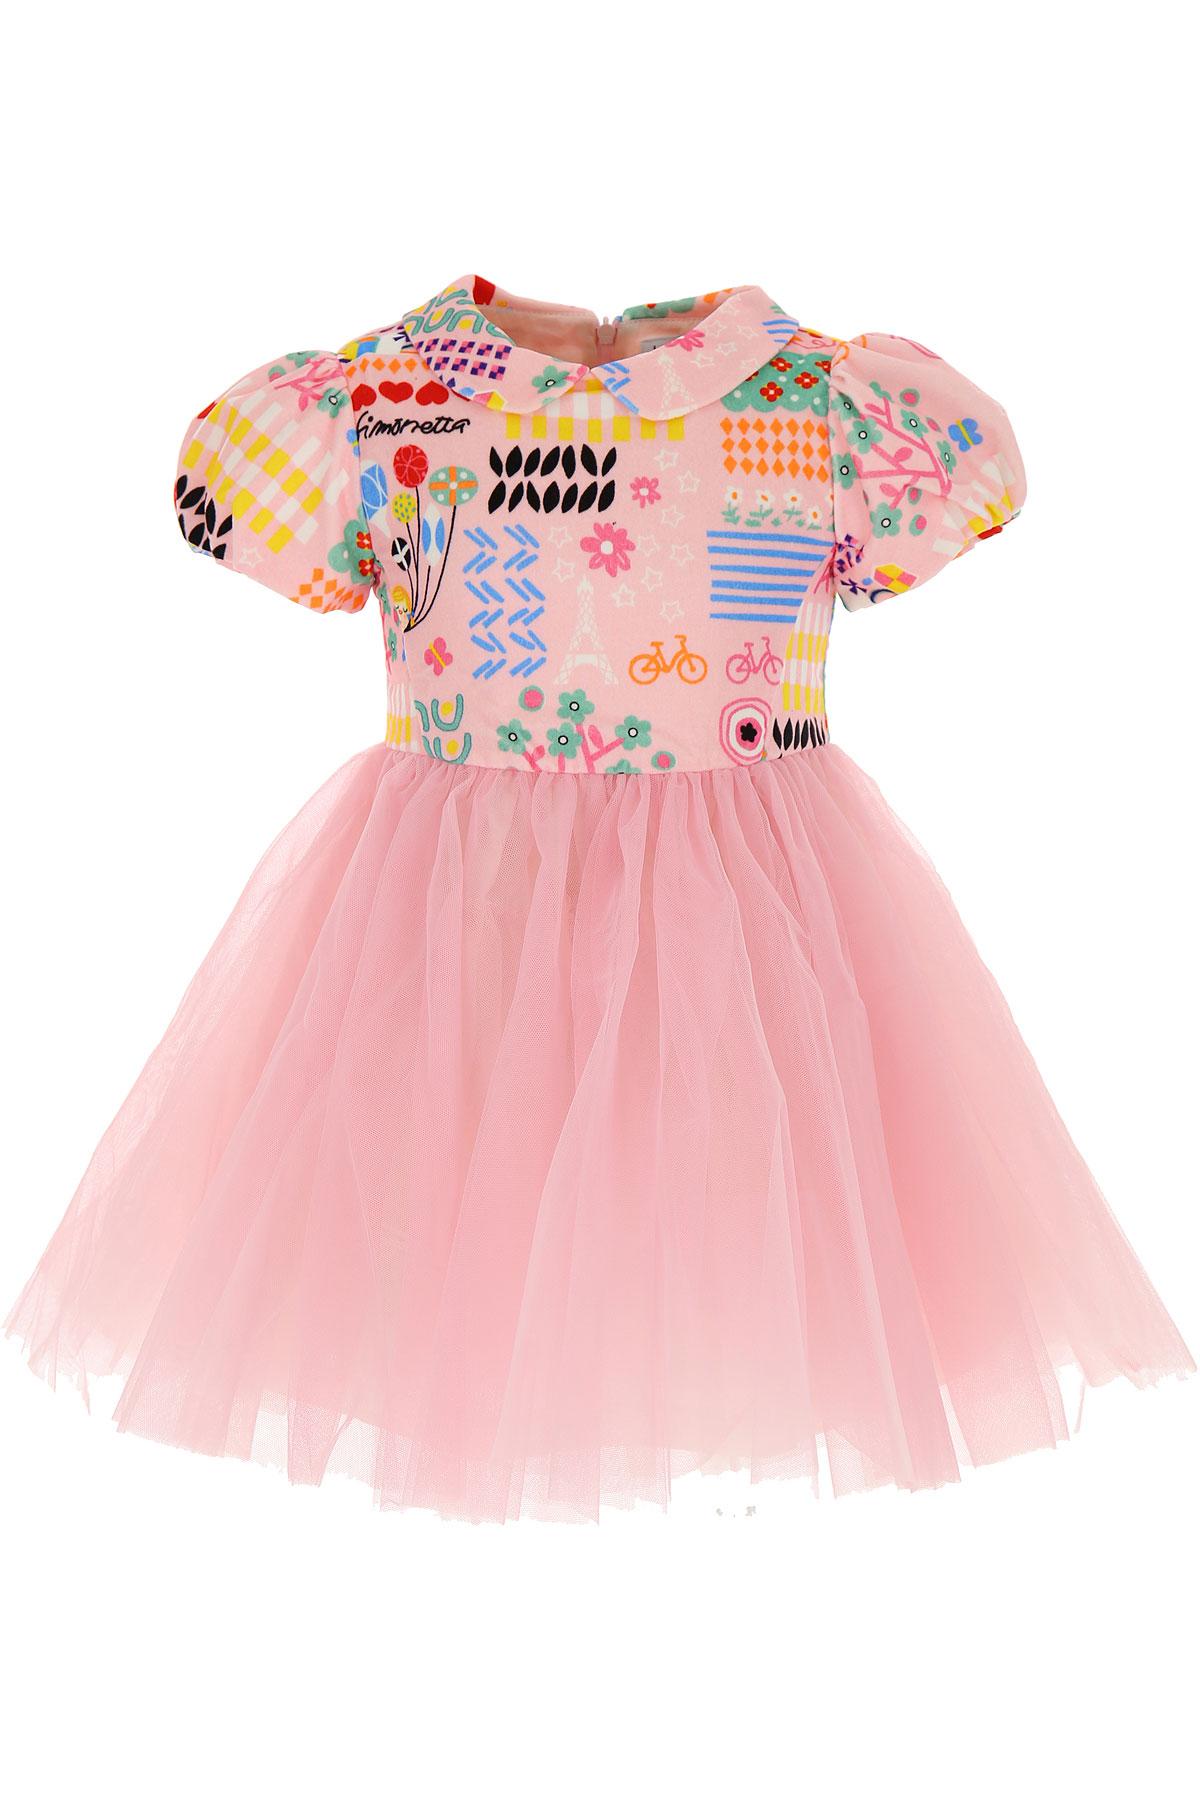 Simonetta Girls Dress On Sale, Pink, Cotton, 2019, 2Y 3Y